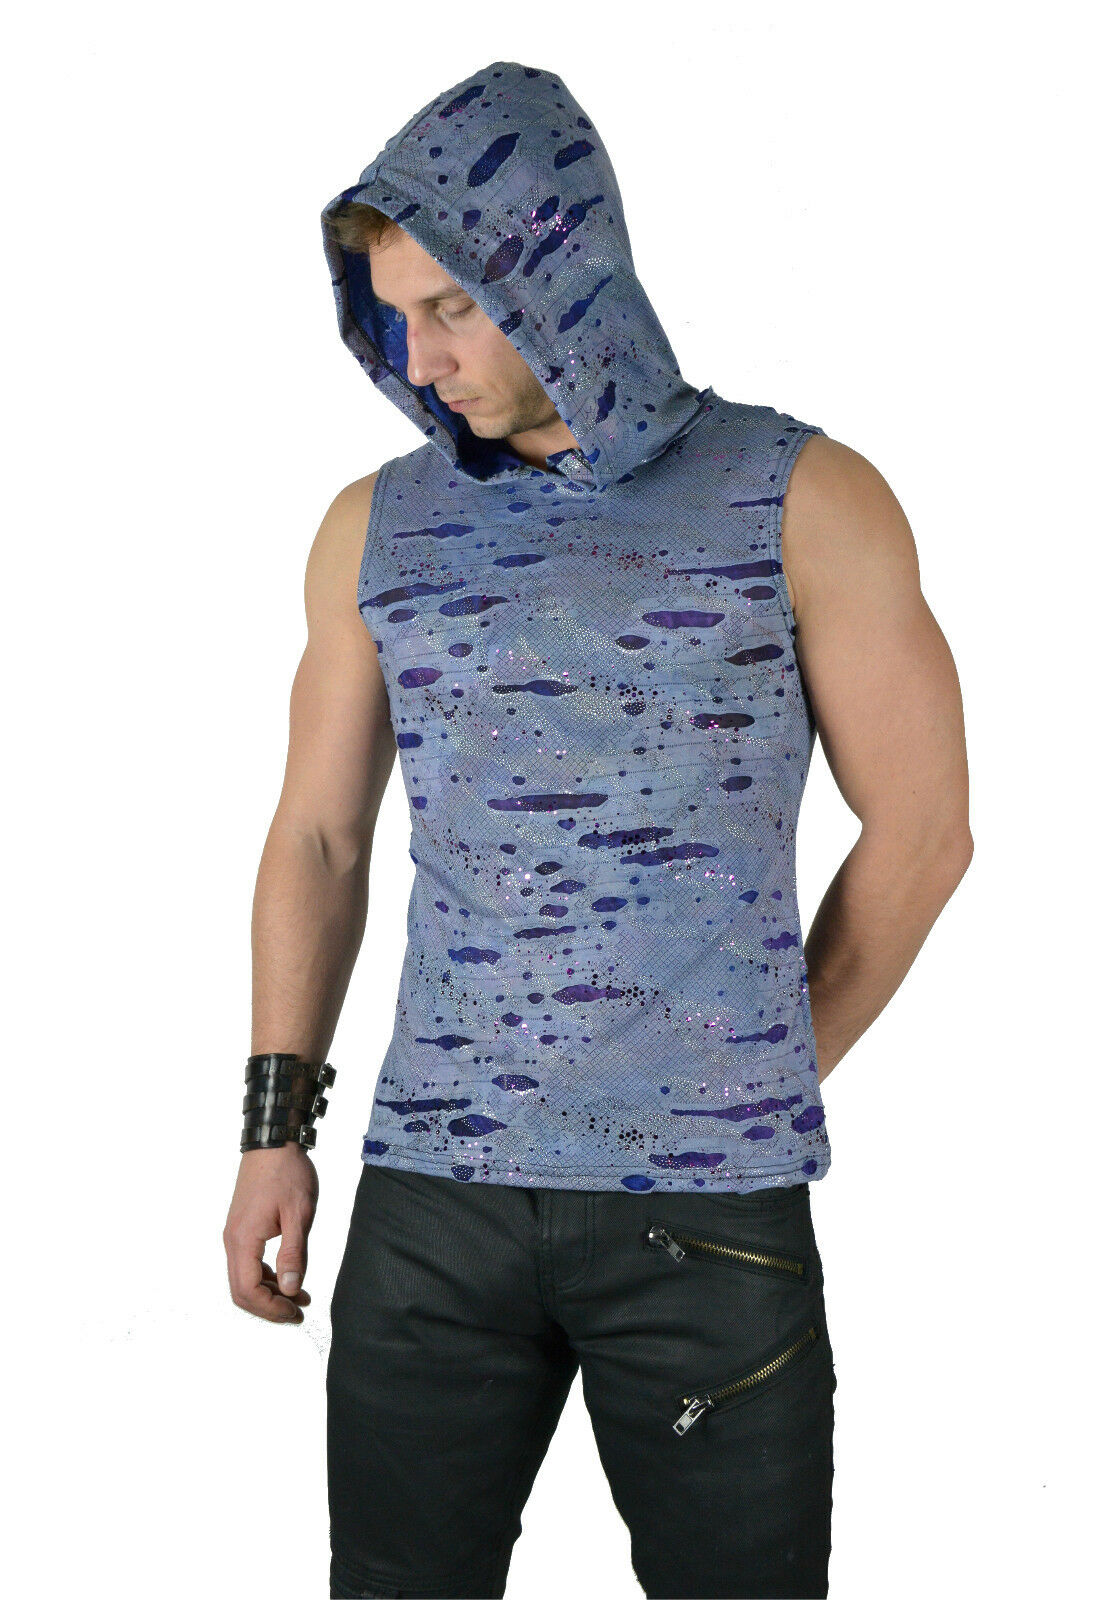 SHRINE GOTH RAVE PUNK CYBER EMO TECHNO BURNING MAN PURPLE DECAYED SHIRT HOODIE Activewear